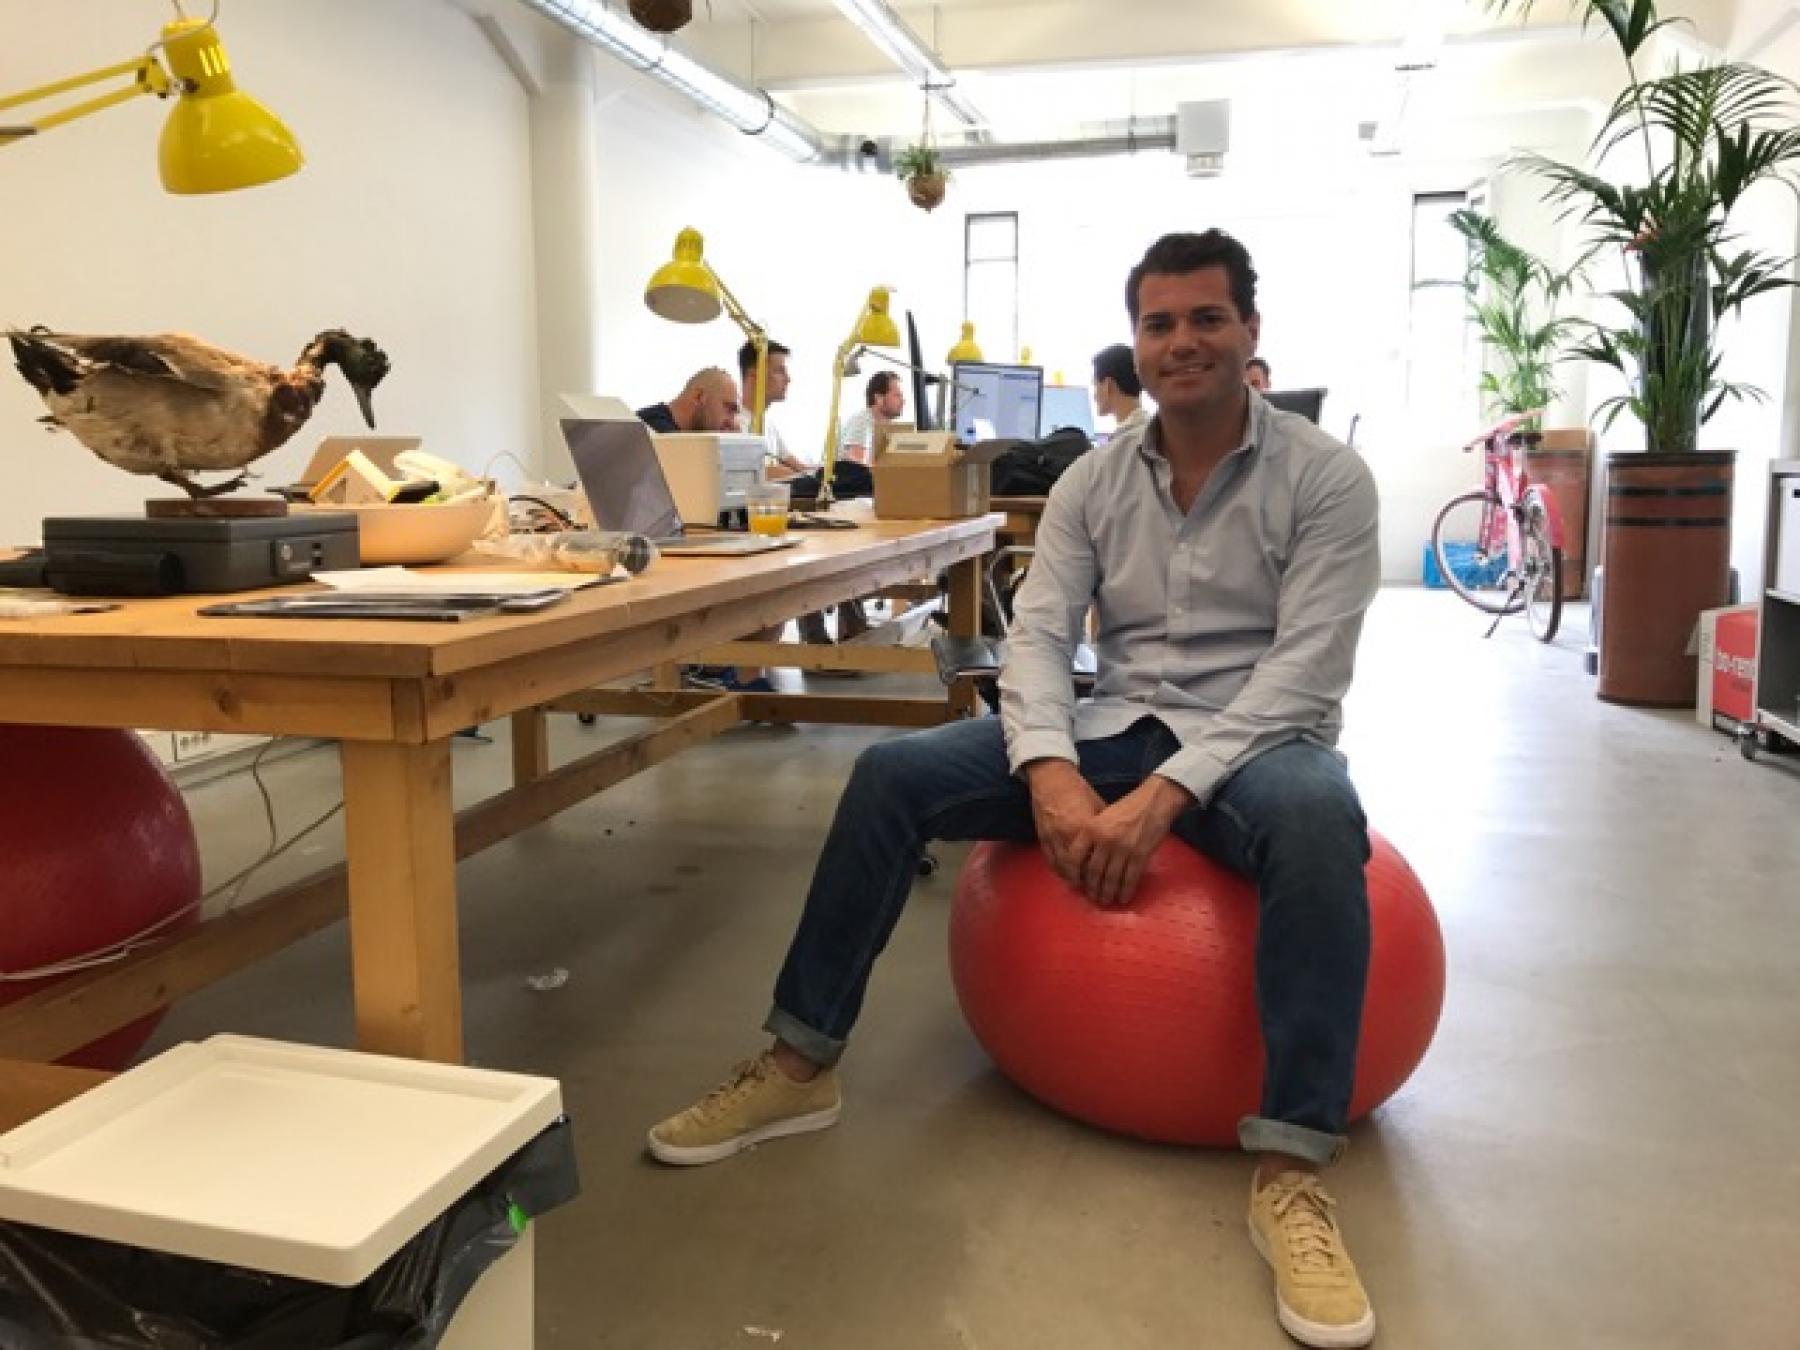 kevin westermeijer co-founder convious saas platform